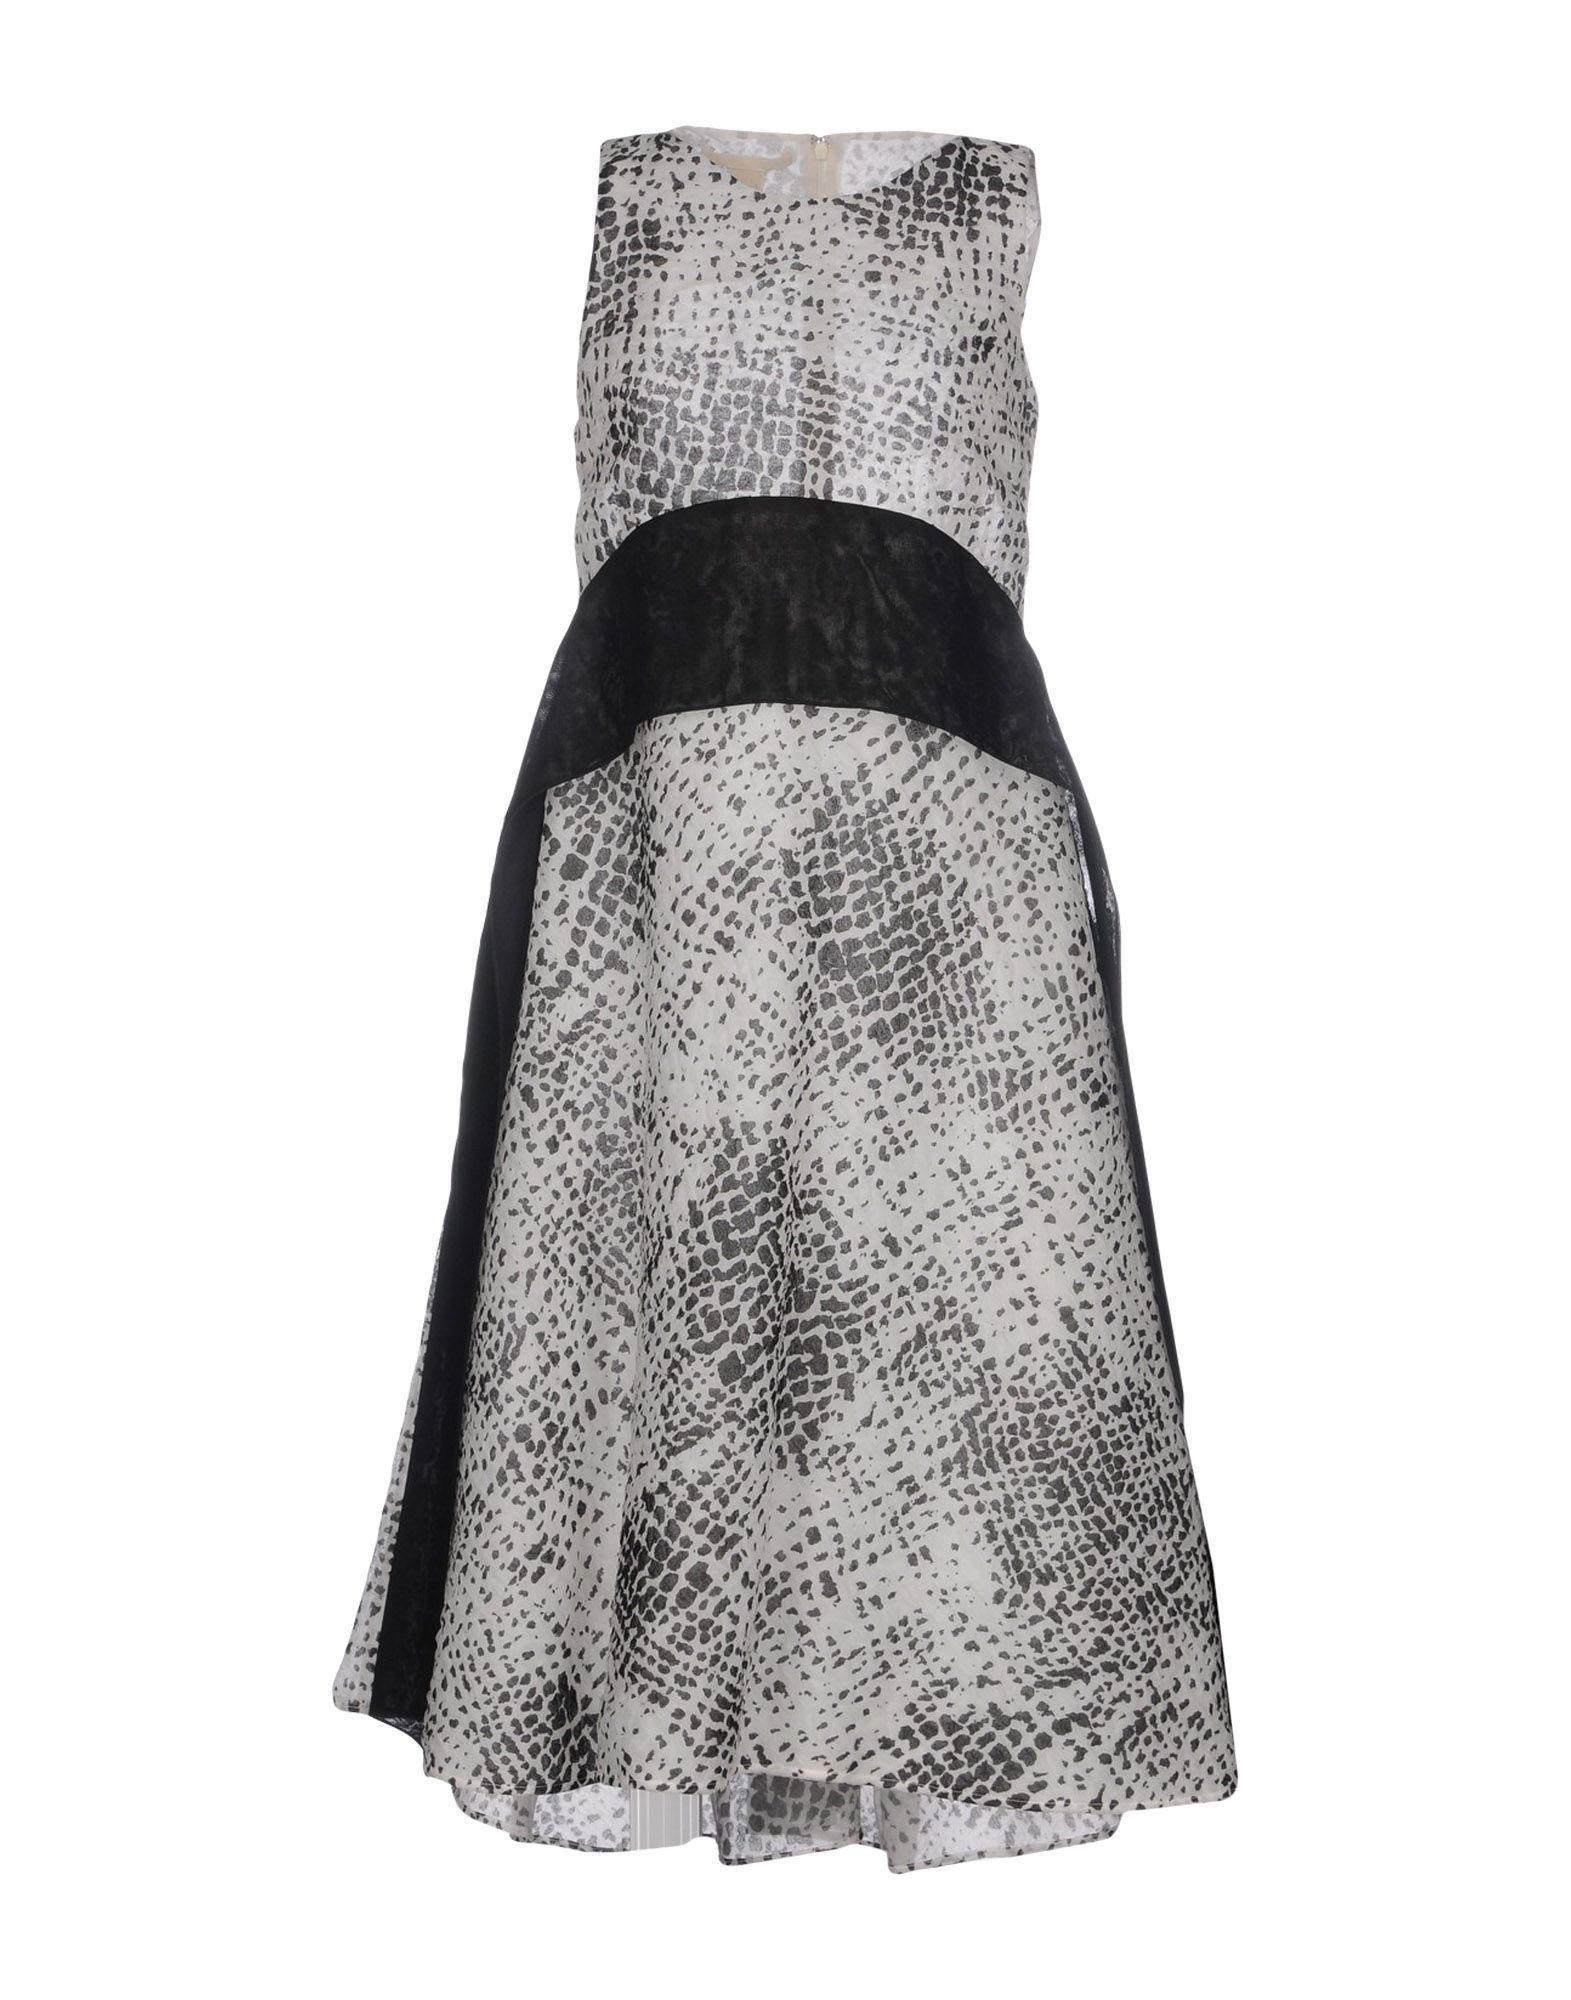 ANTONIO BERARDI Платье до колена sly010 платье до колена